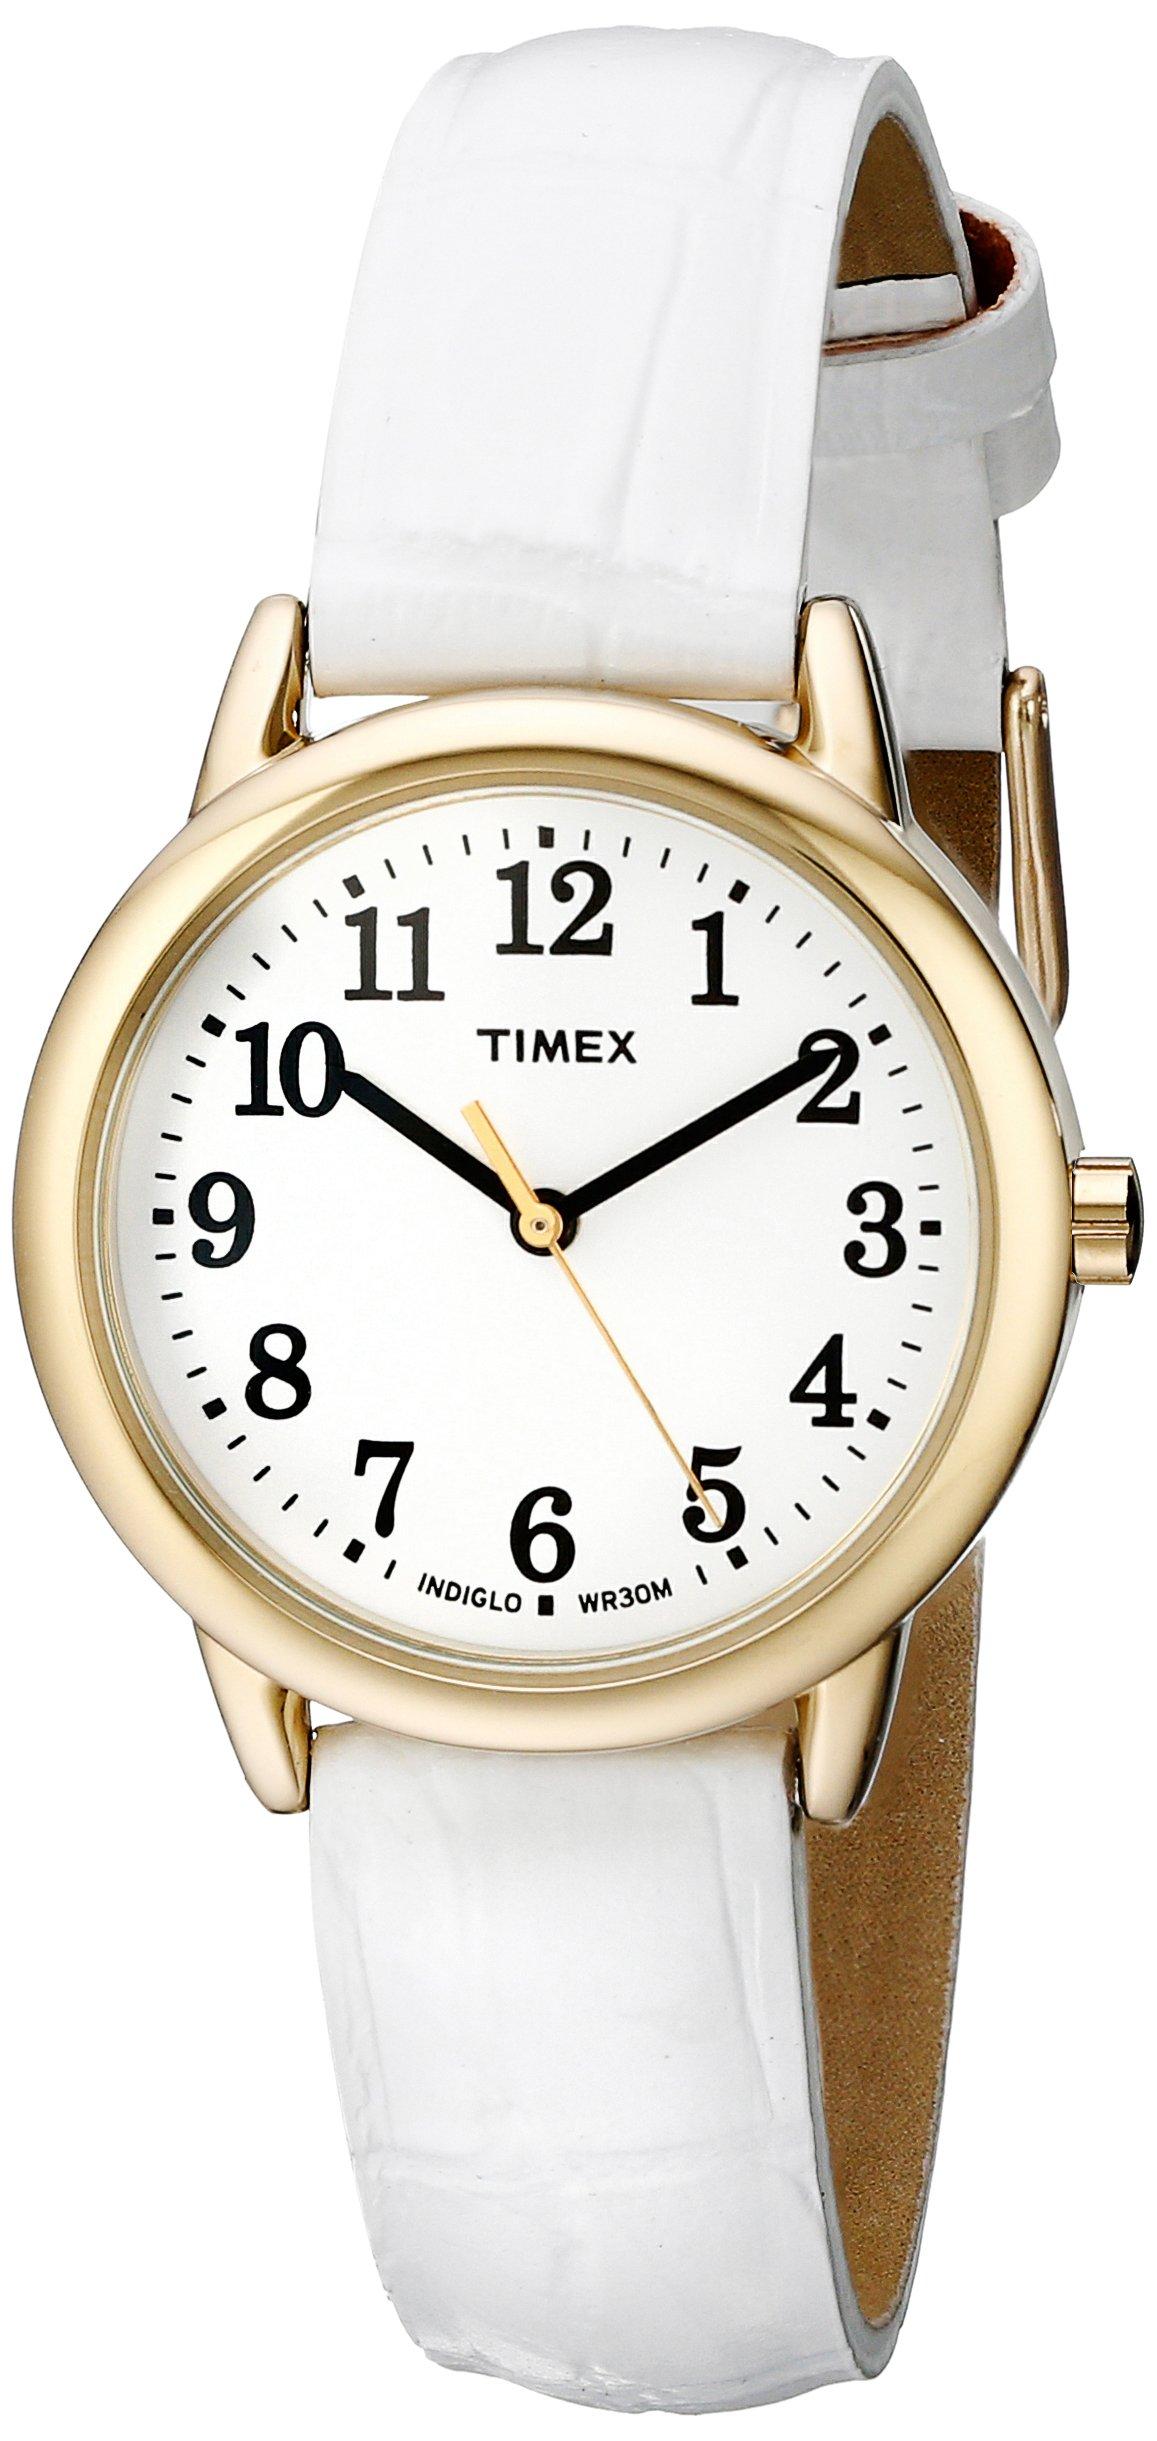 ویکالا · خرید  اصل اورجینال · خرید از آمازون · Timex Women's TW2P68900 Easy Reader White Croco Pattern Leather Strap Watch wekala · ویکالا